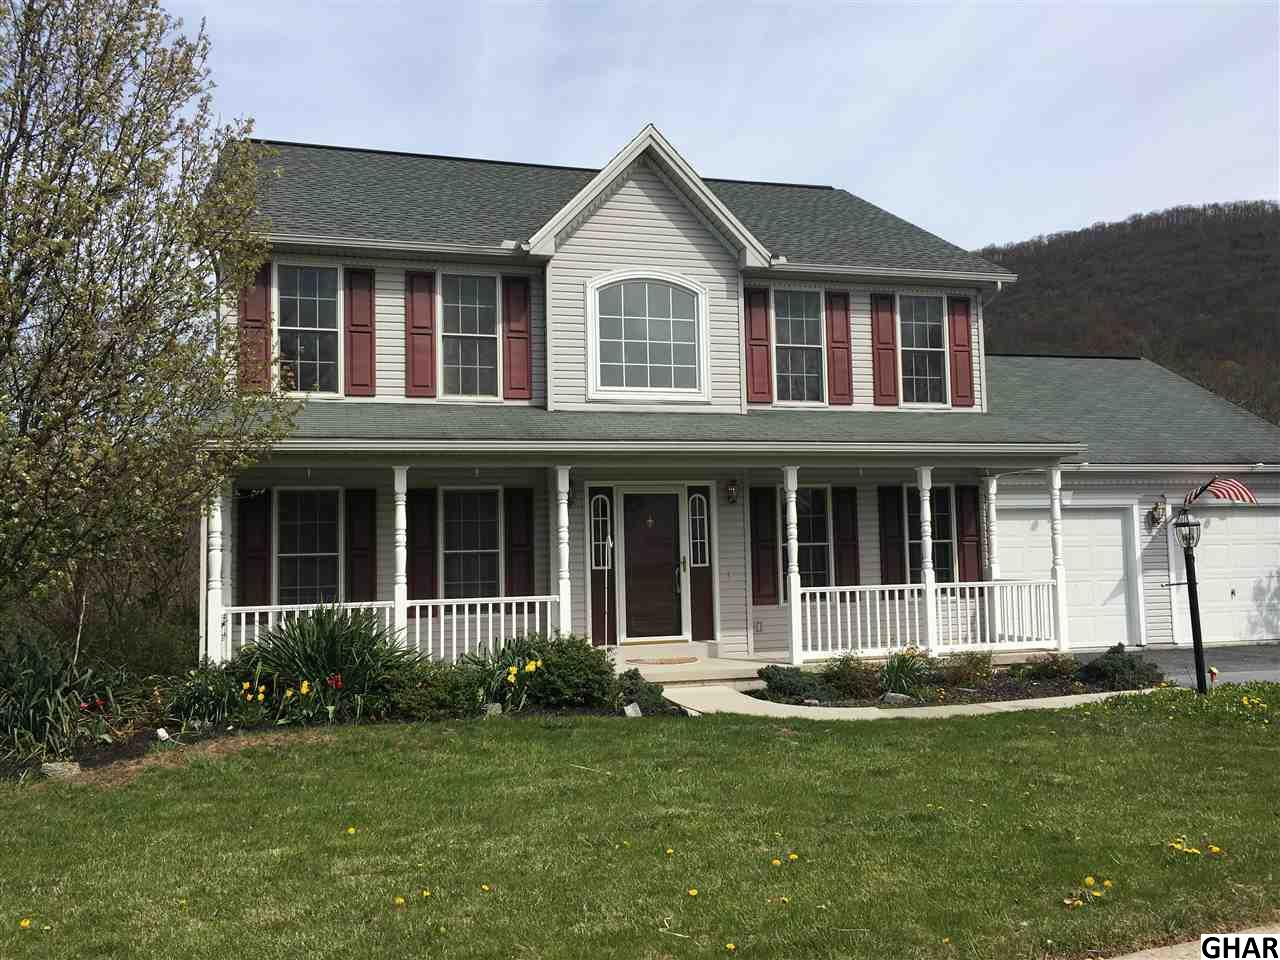 Real Estate for Sale, ListingId: 35923853, Dauphin,PA17018